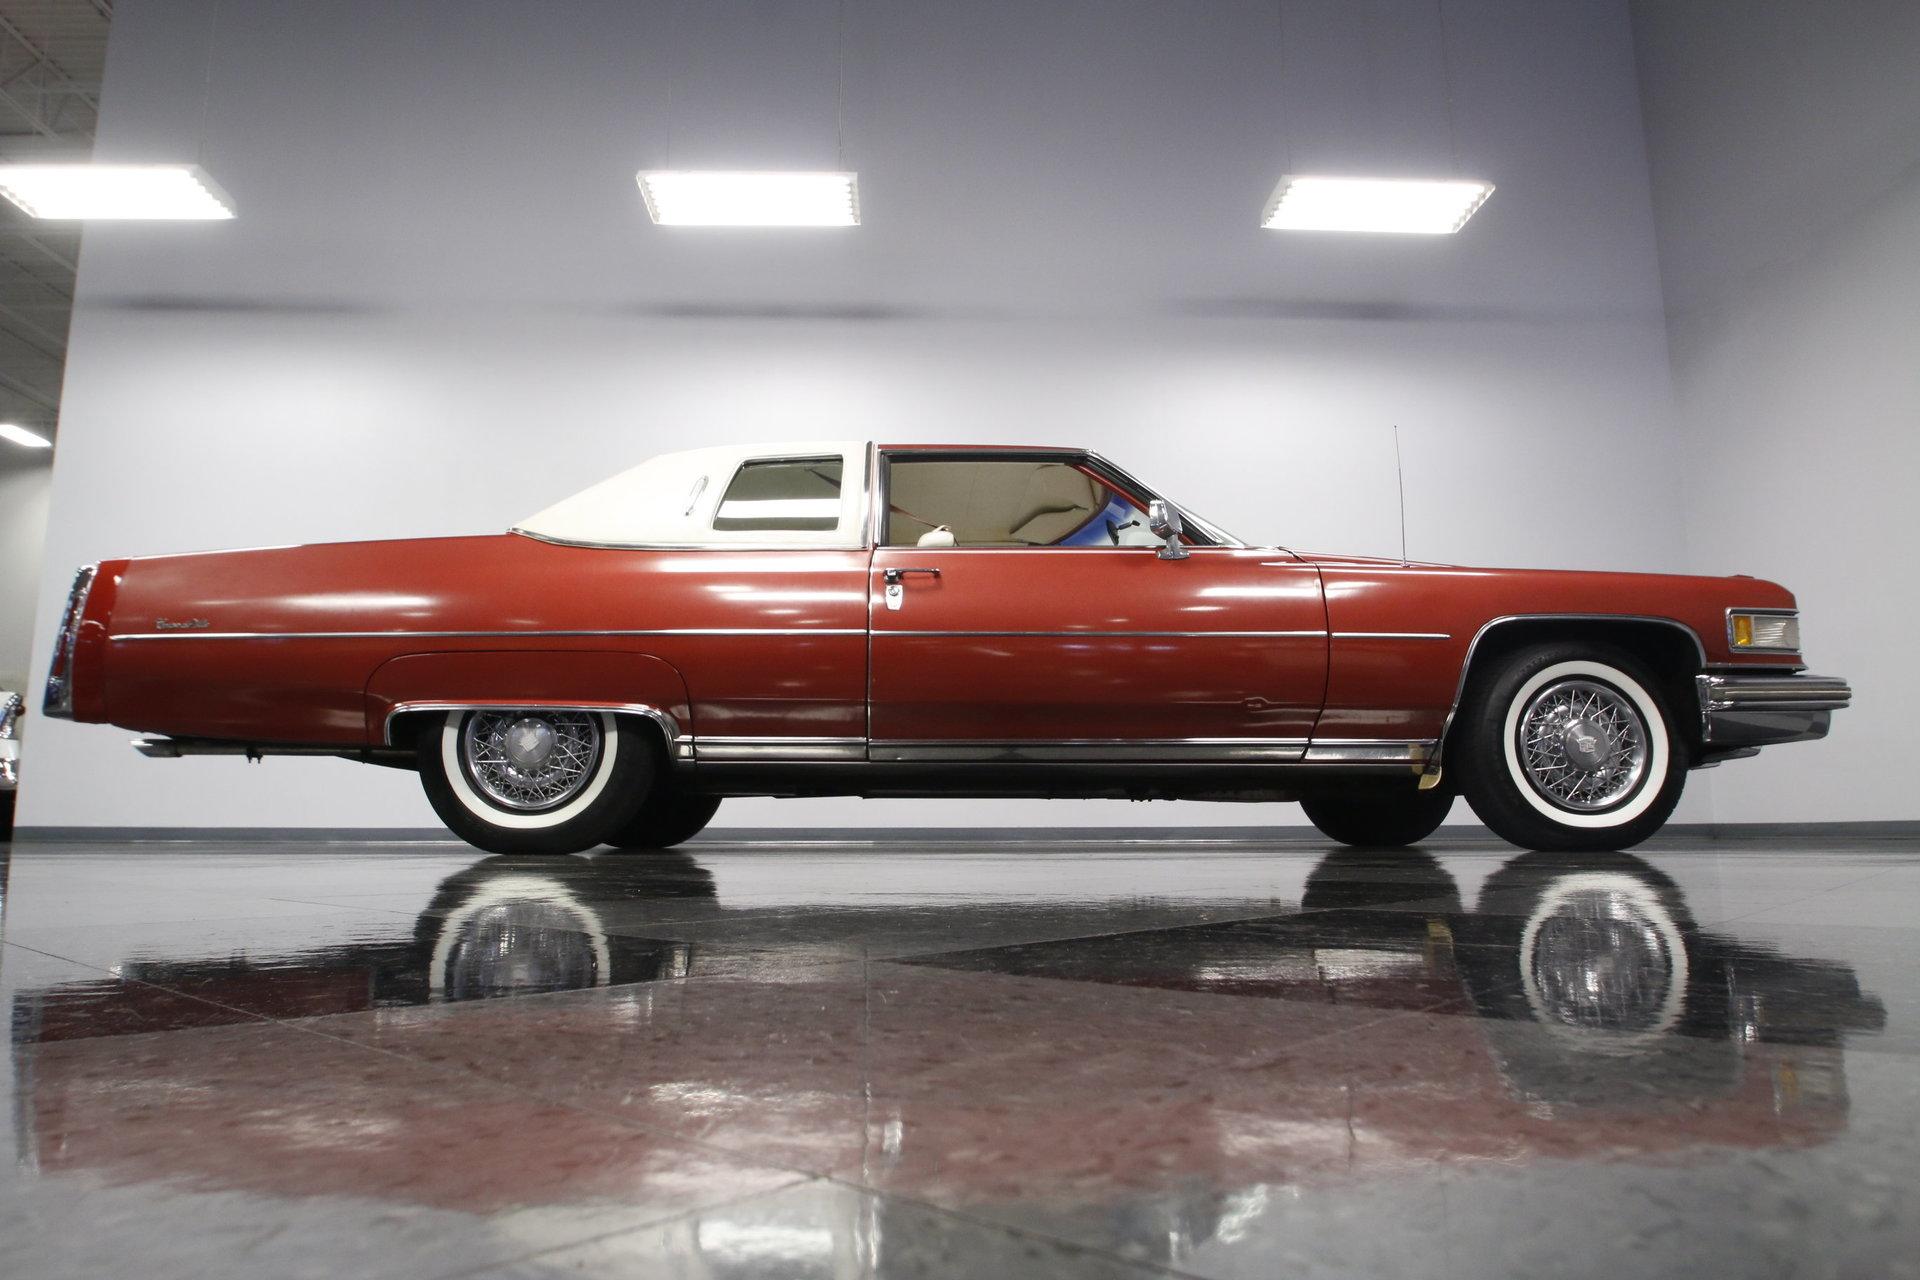 1976 Cadillac Coupe DeVille for sale #75163 | MCG